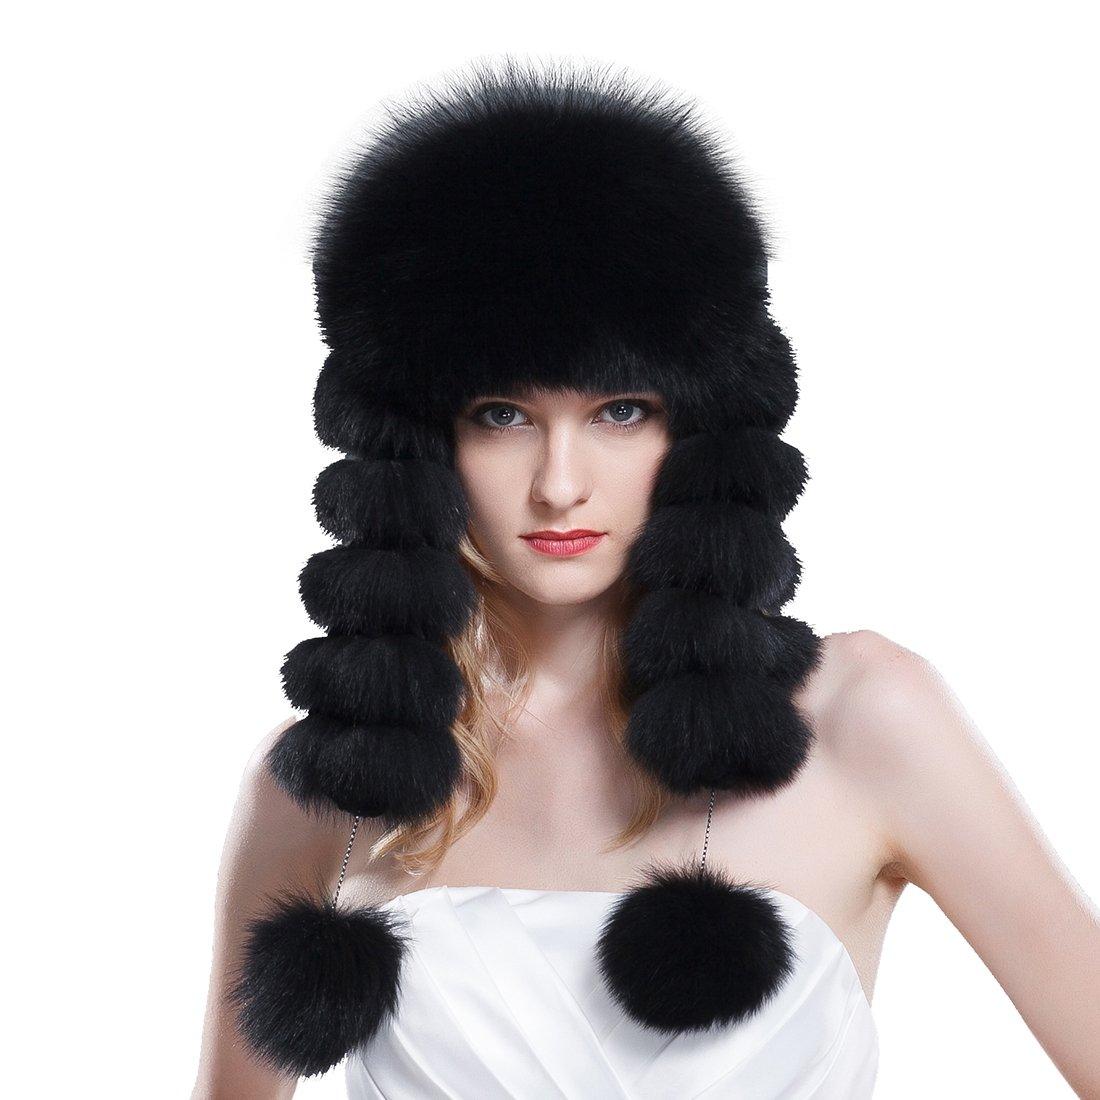 URSFUR Women's Black Fox Fur Russian Ushanka Hats with Leather Top